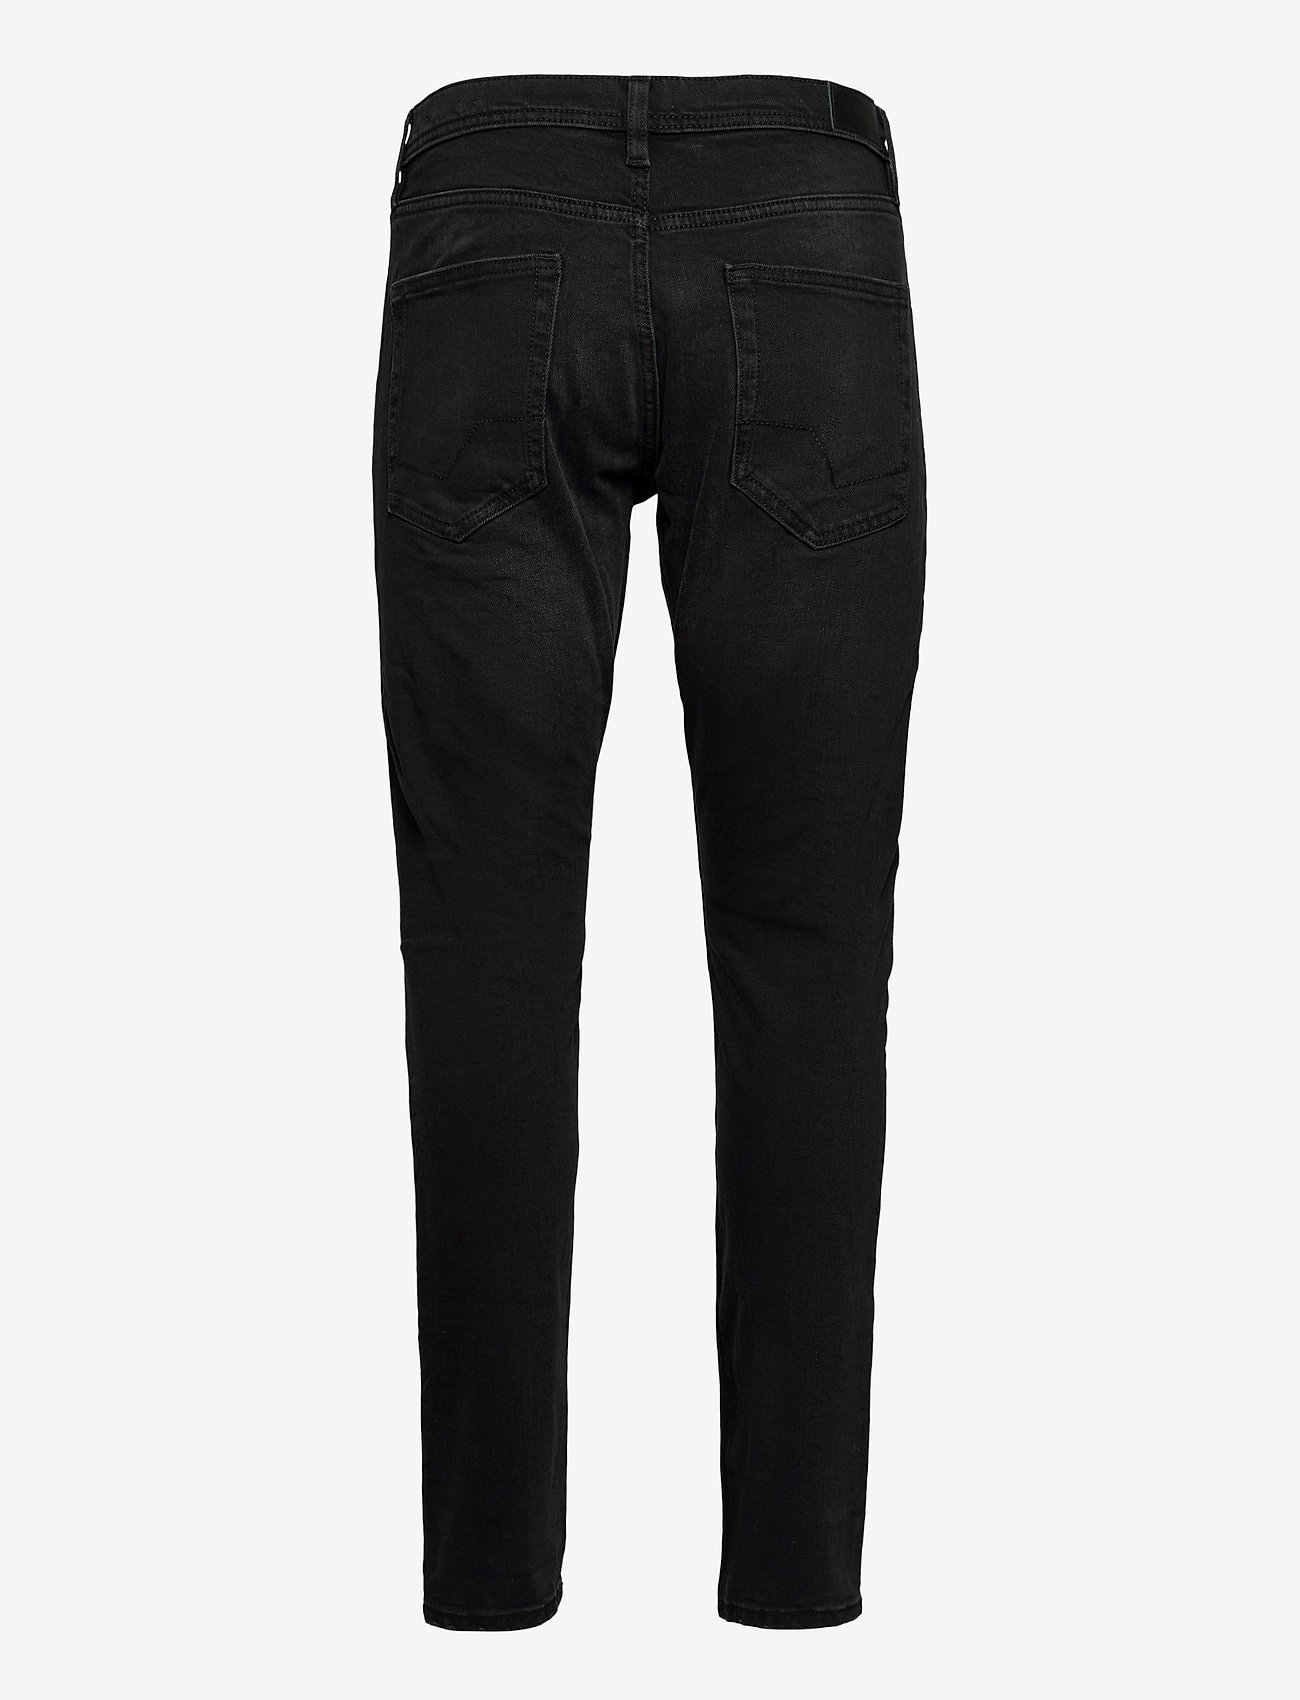 Esprit Casual - Pants denim - slim jeans - black dark wash - 1